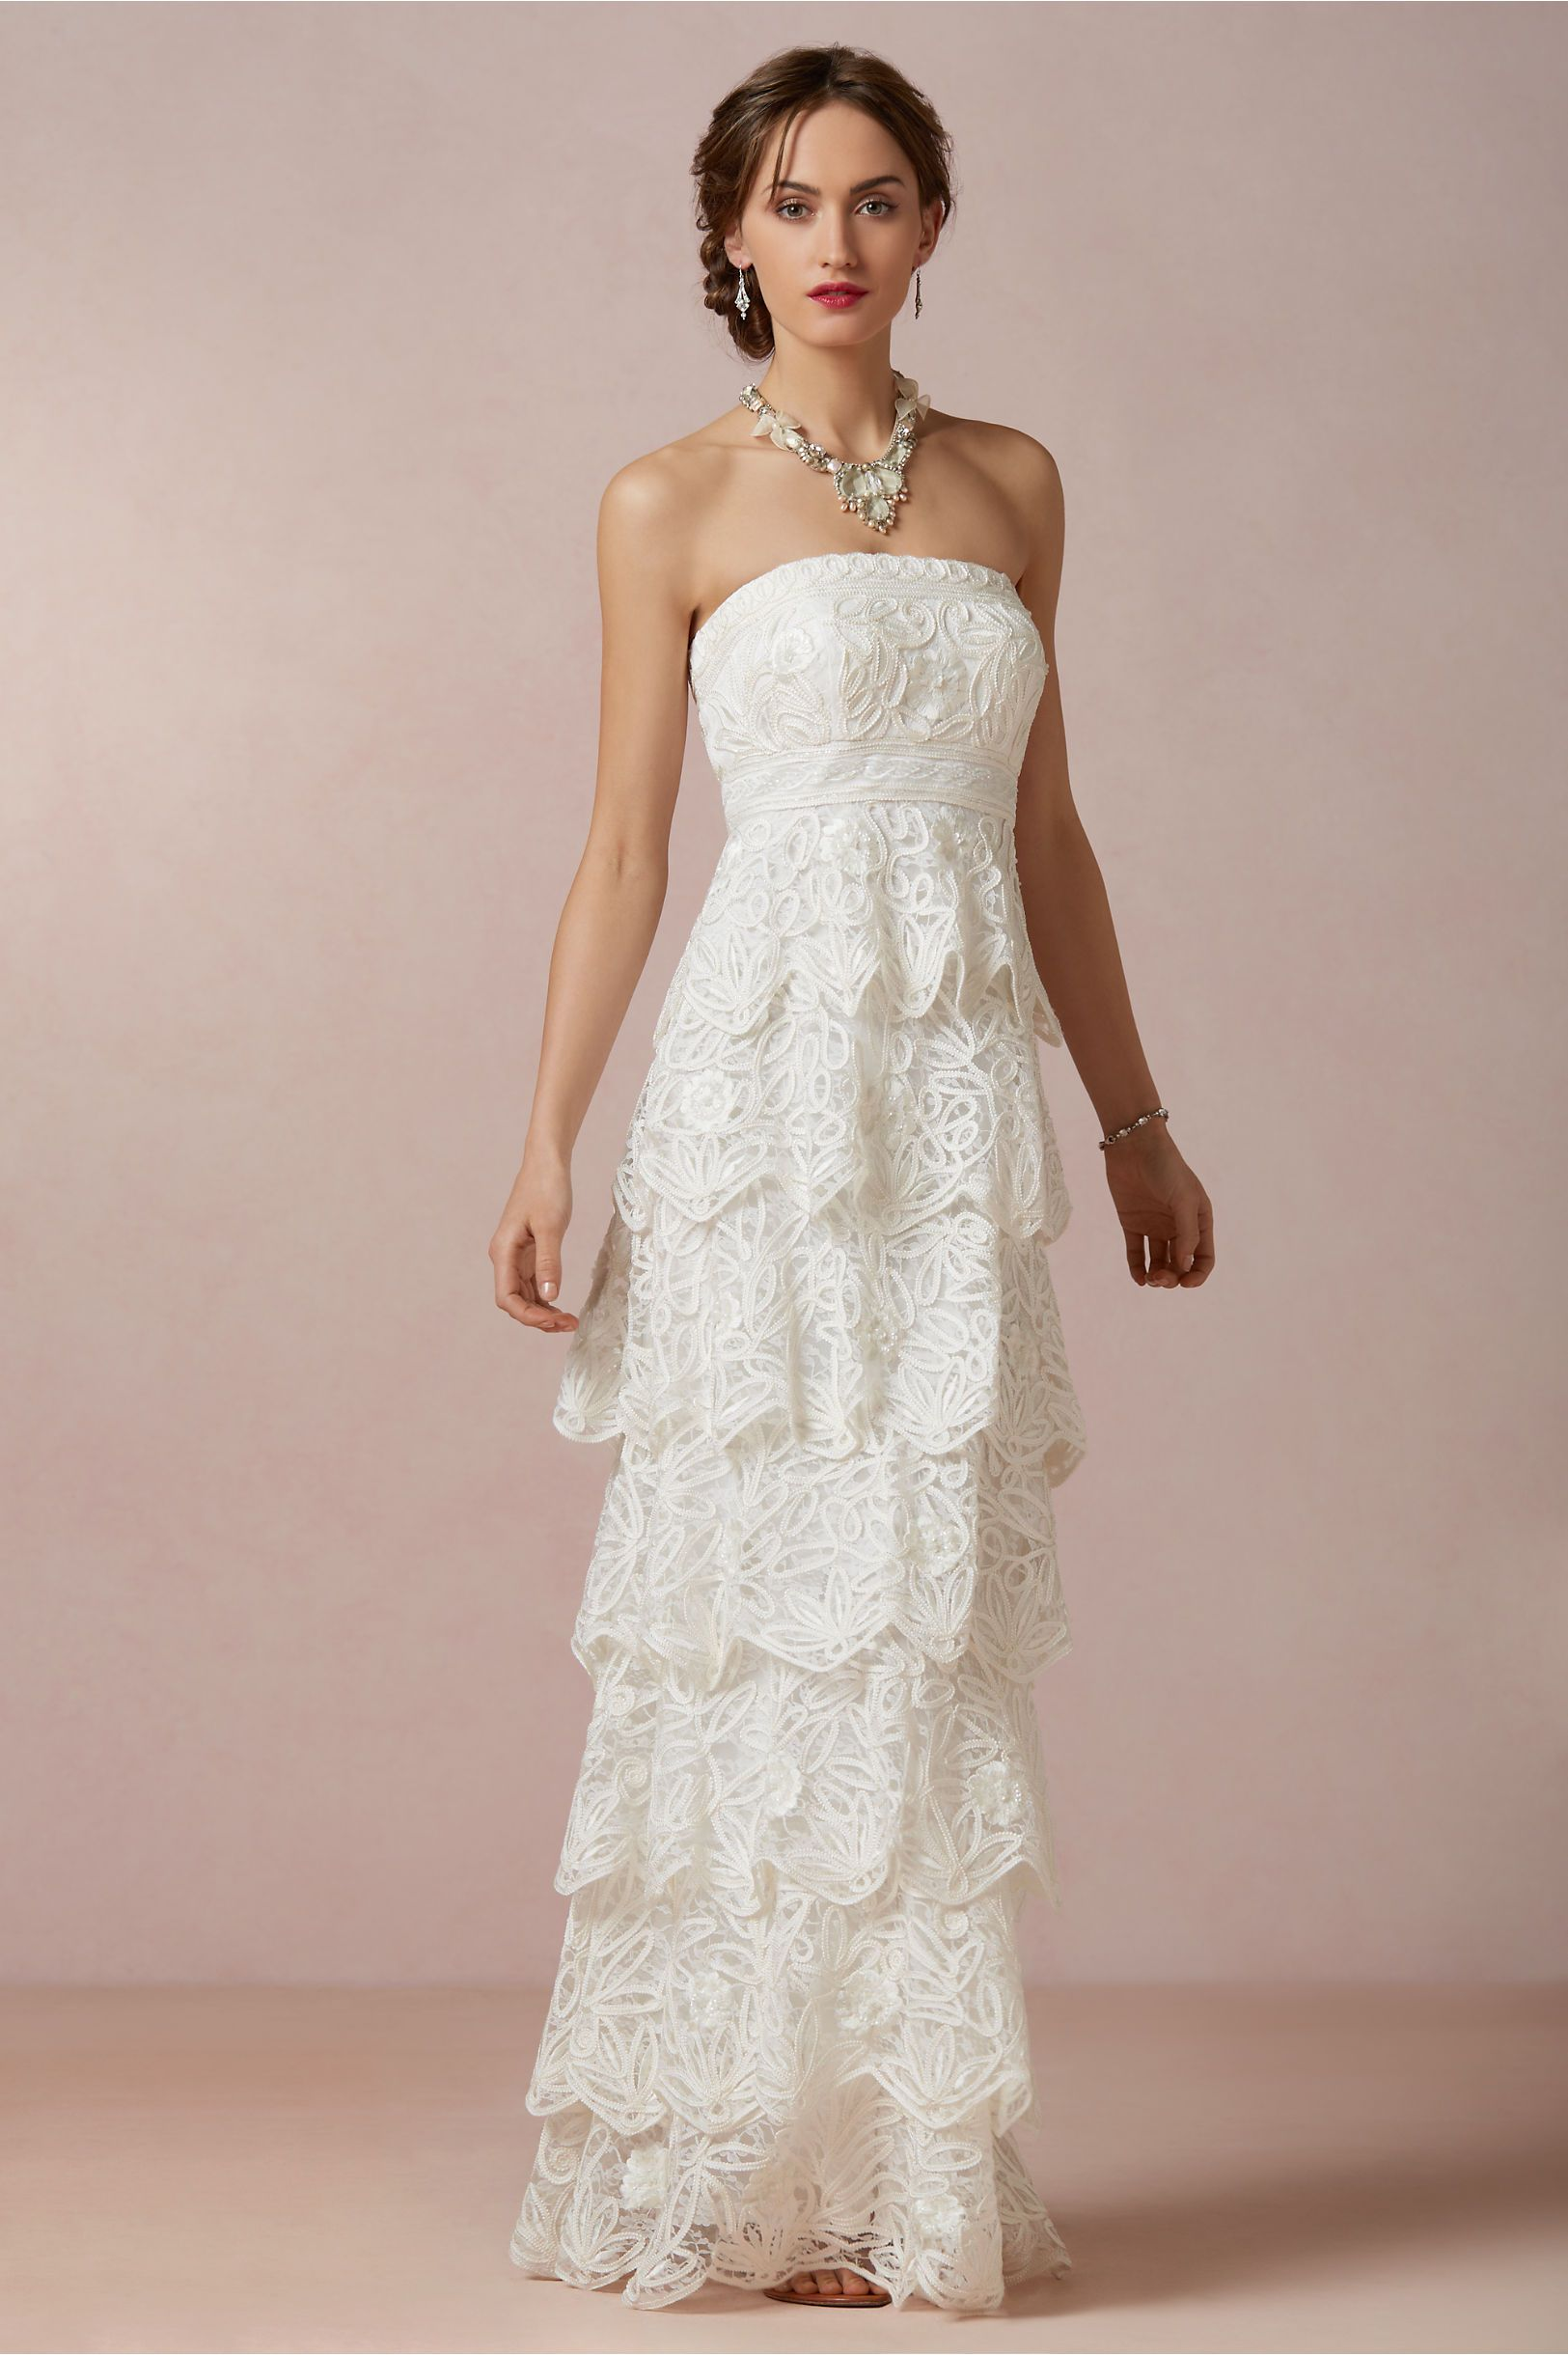 Nice dresses for wedding  Joss Gown in Bride Wedding Dresses at BHLDN  Wedding Ideas